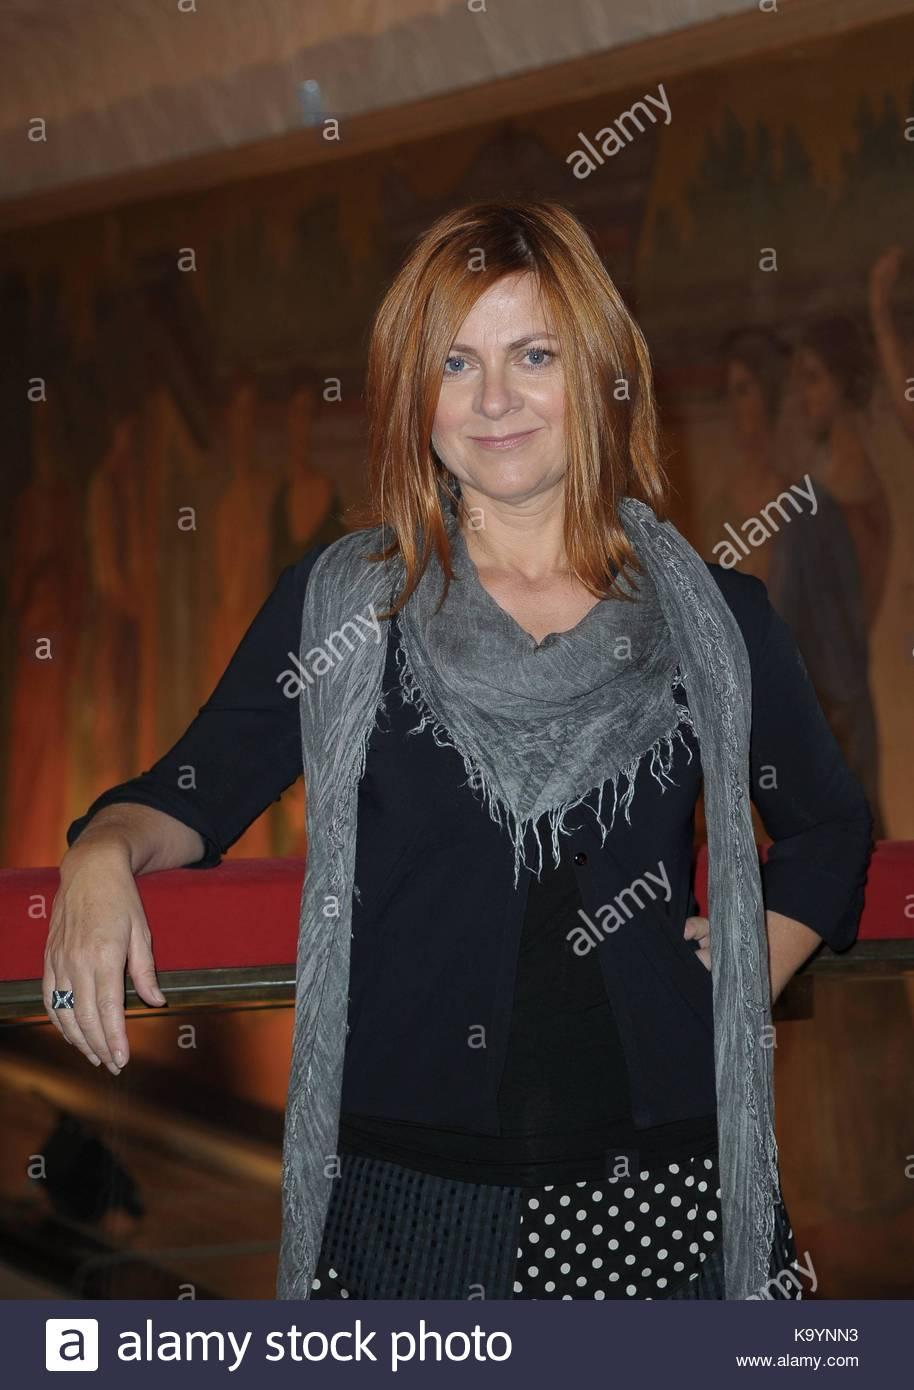 Discussion on this topic: Elise Crombez BEL 2 2006-2007, marina-massironi/